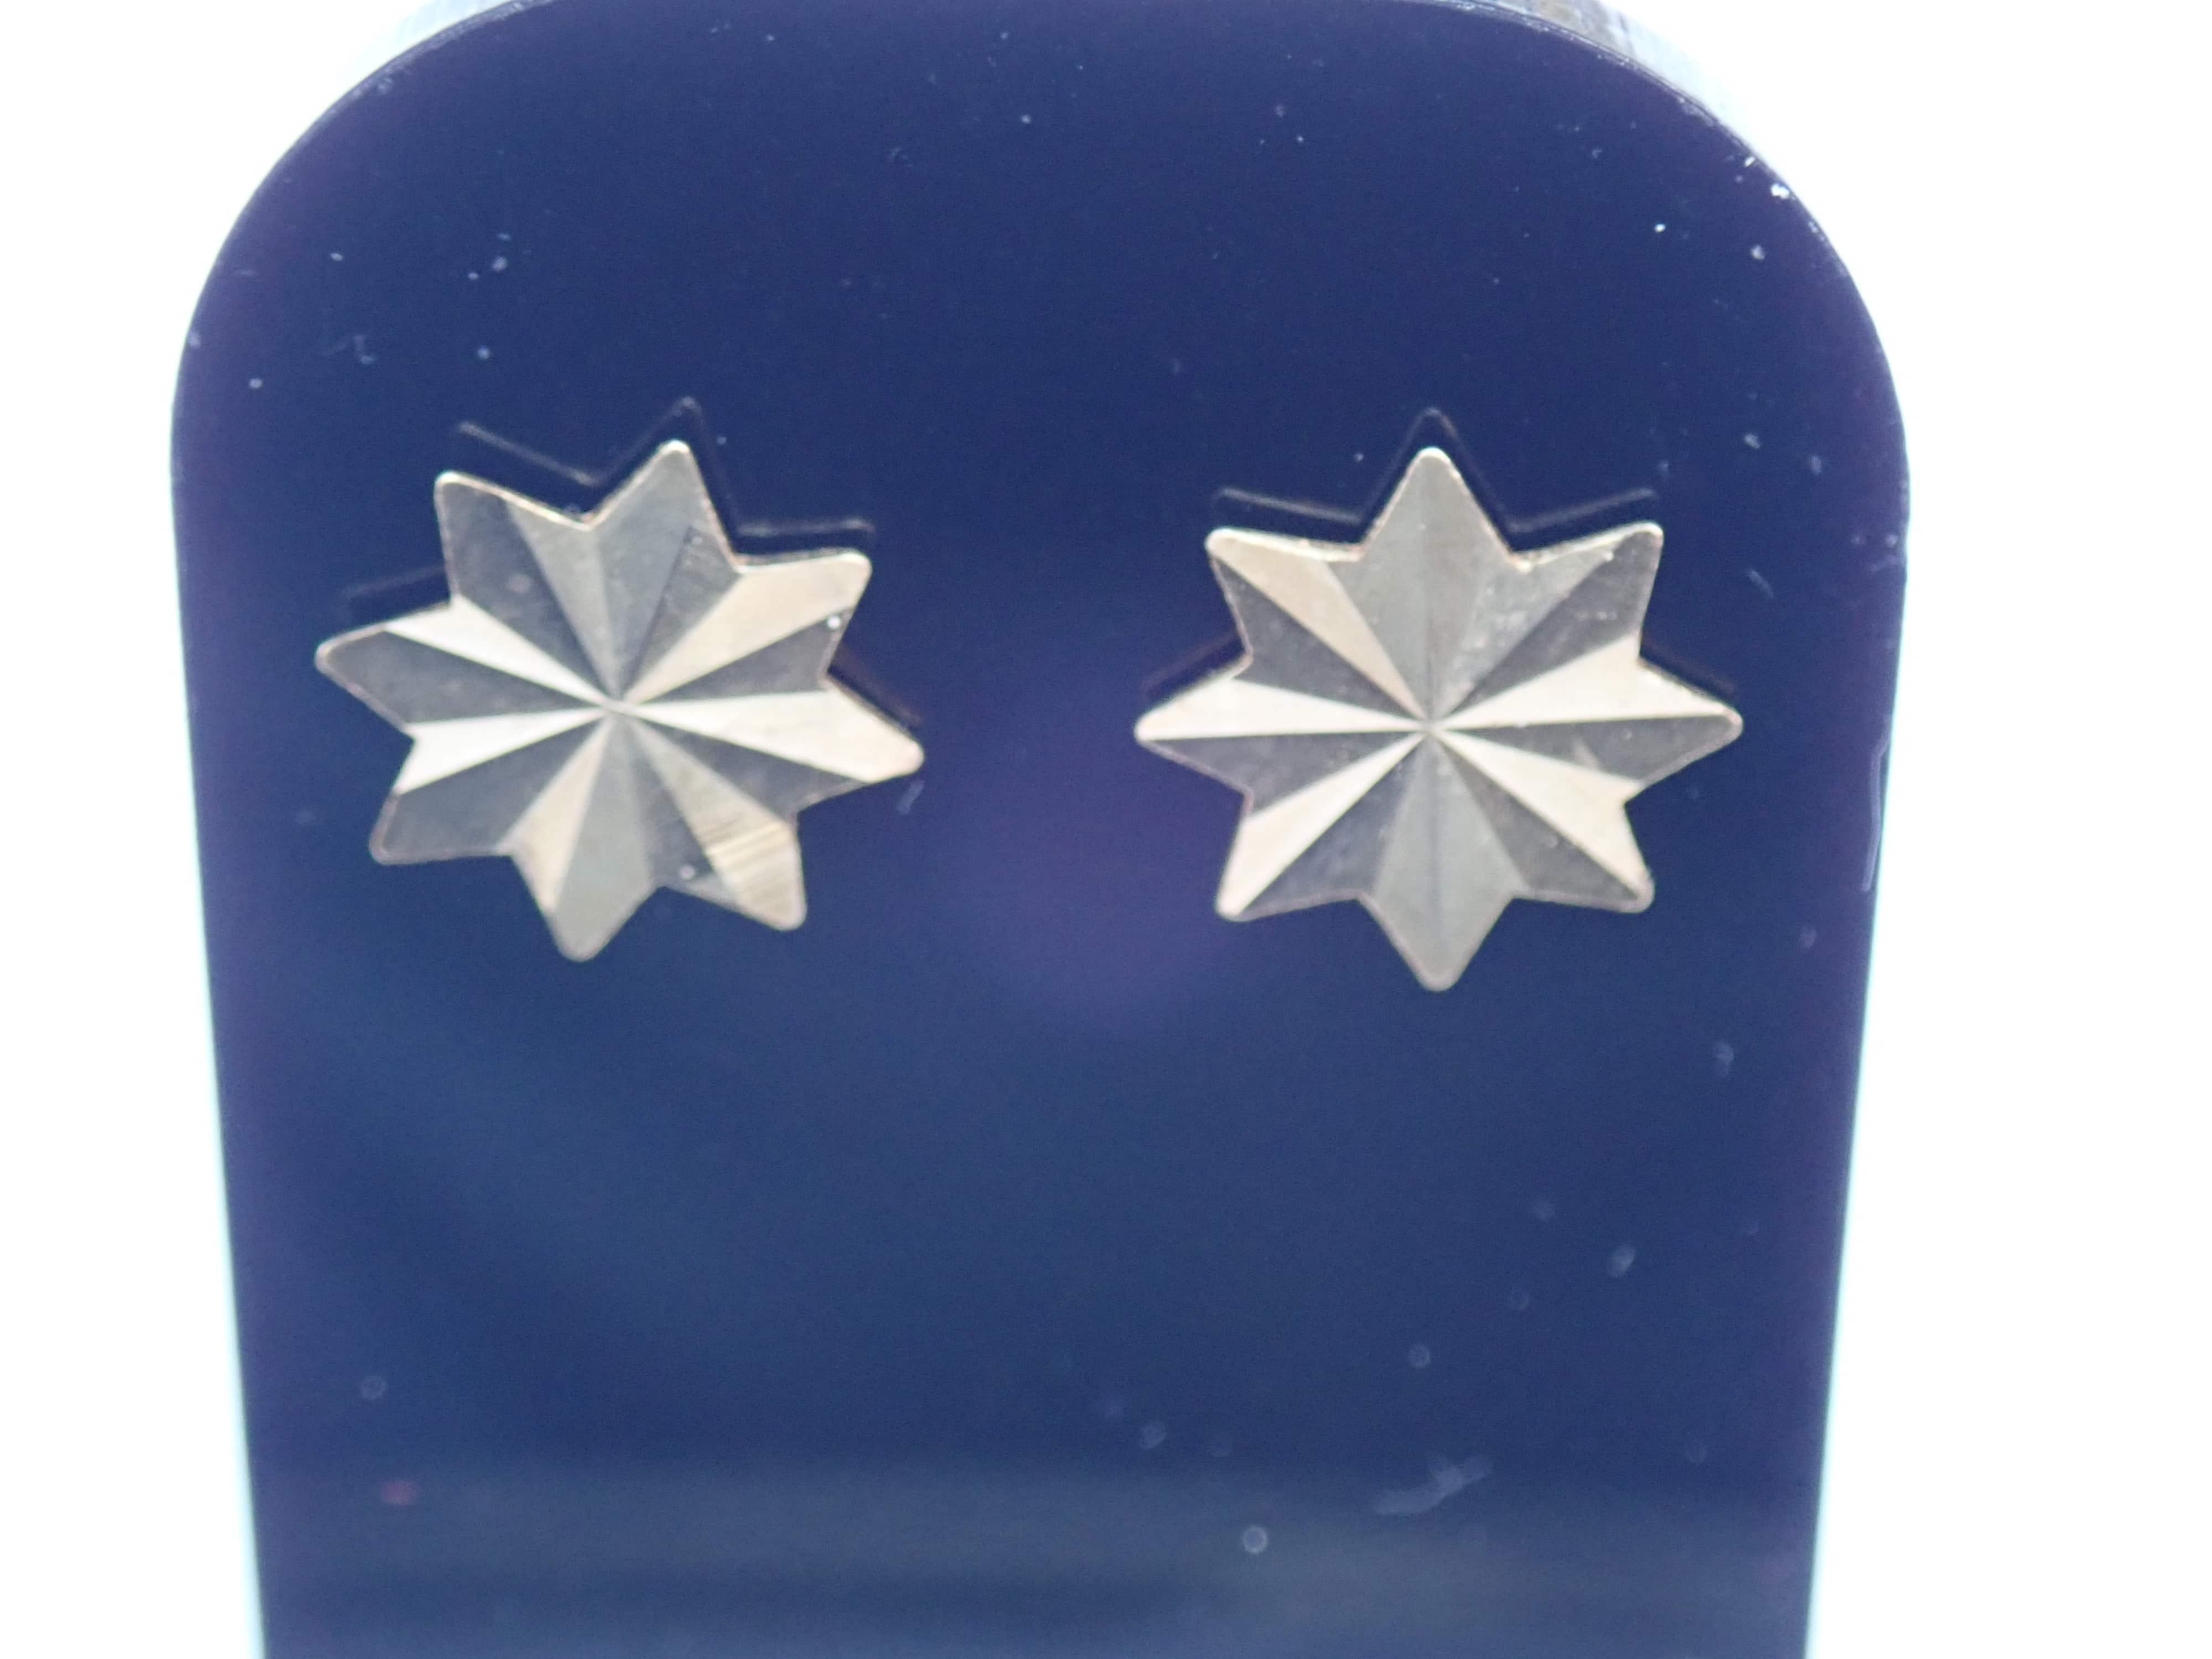 Solid 9k Carat Yellow Gold Star Earrings & Butterfly's 0.65g